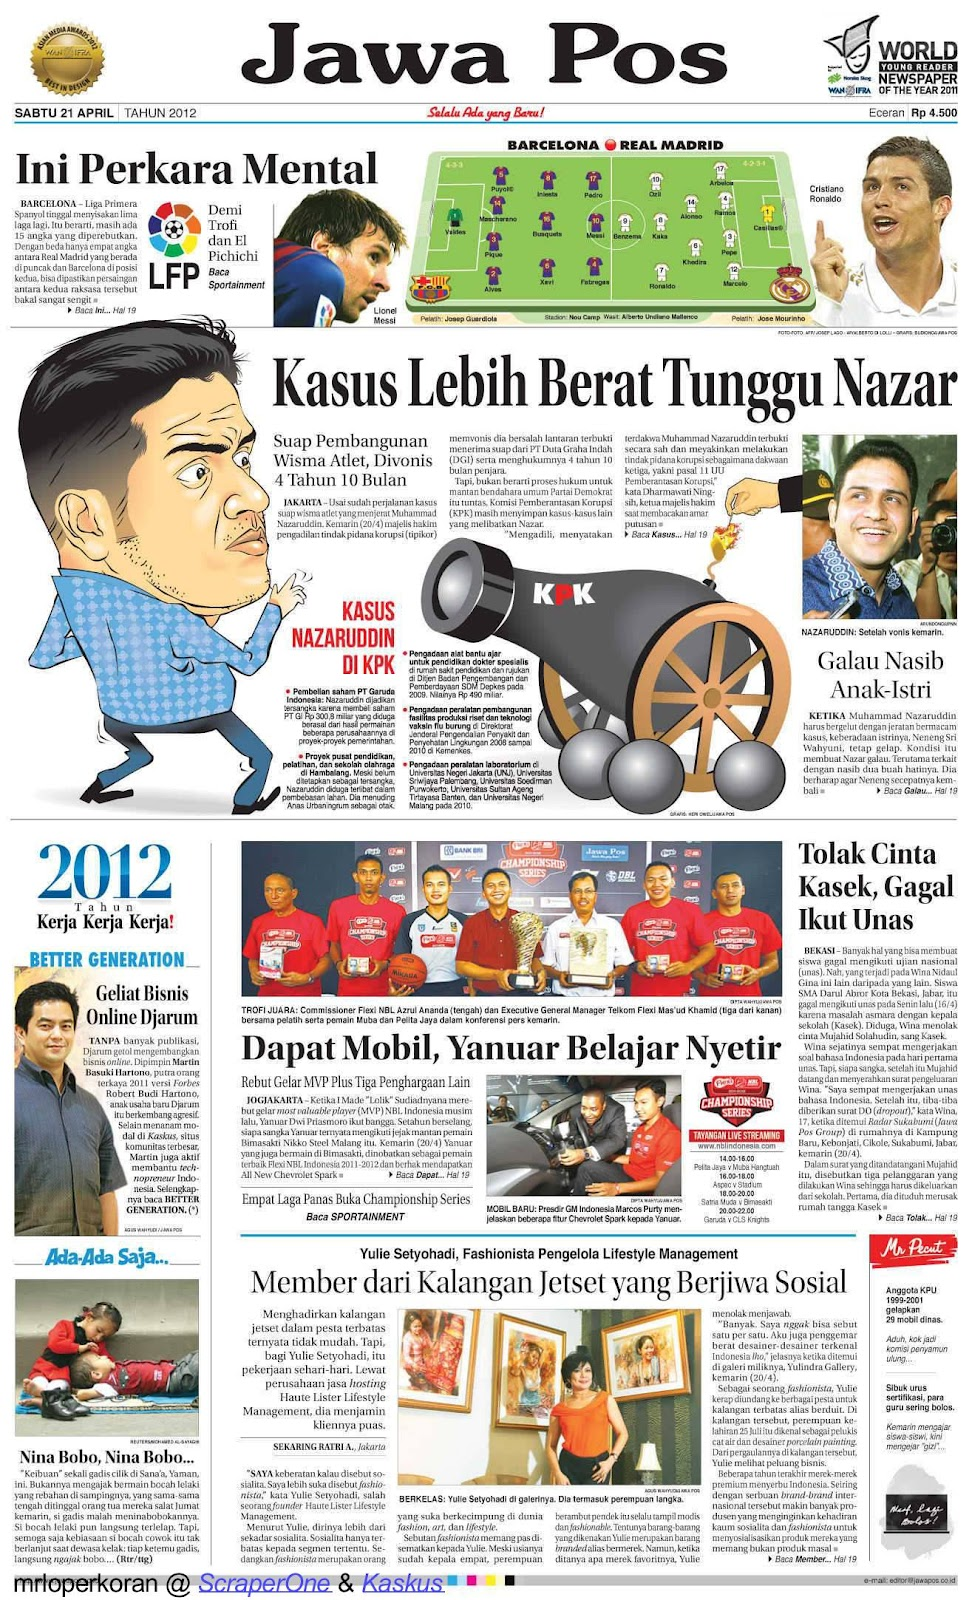 Pdf hari jawa koran pos ini